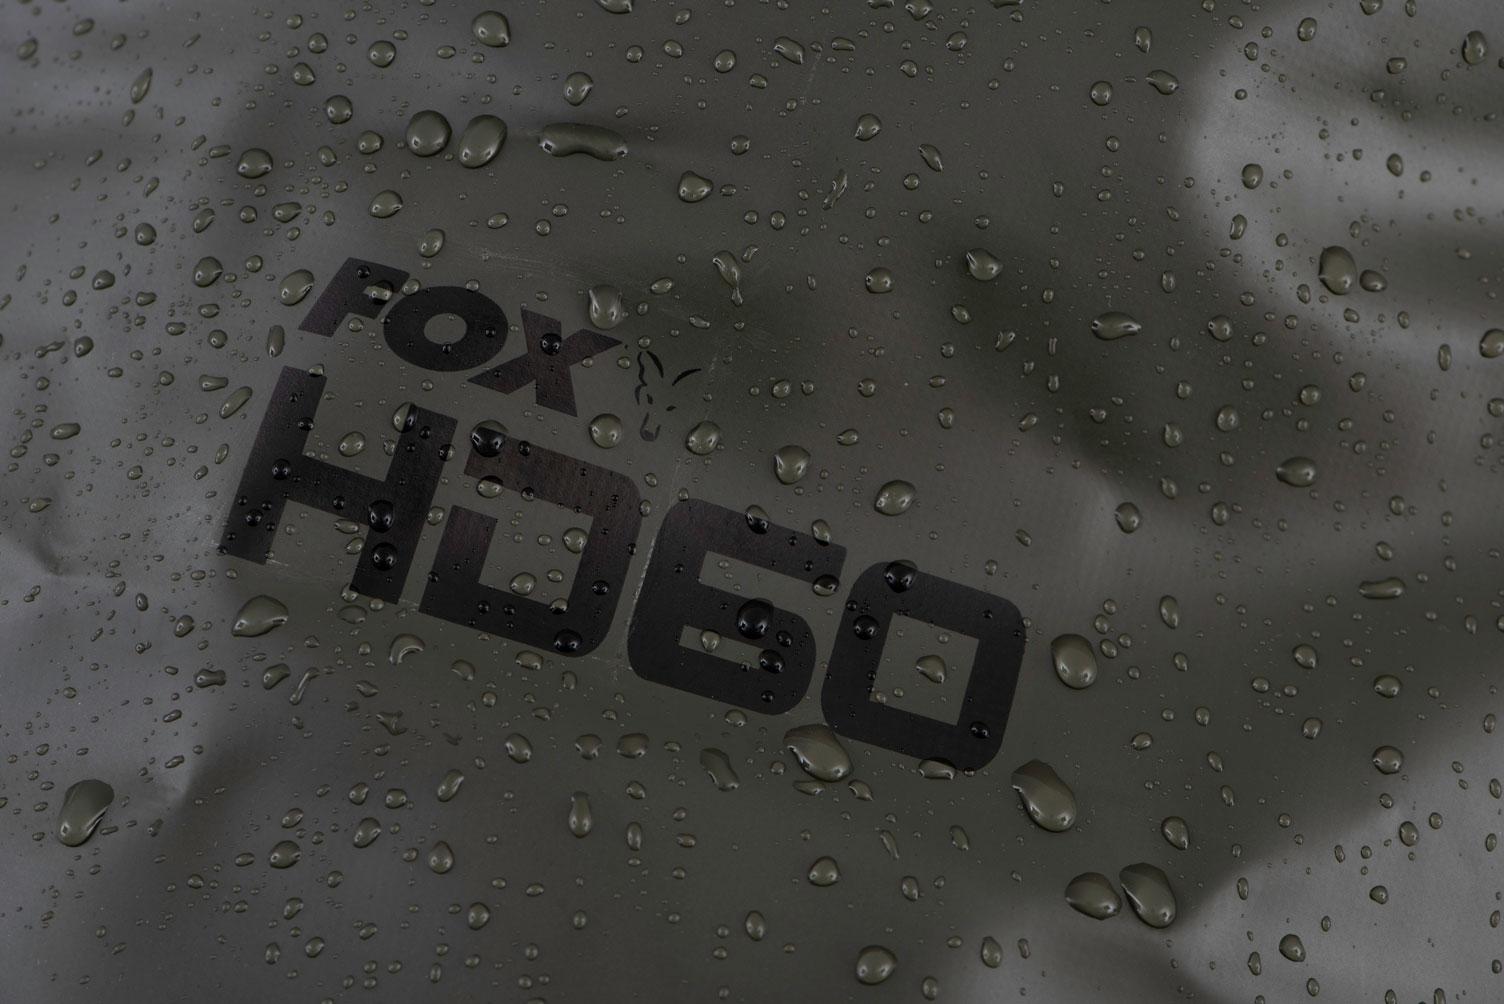 hd60_wet_logojpg